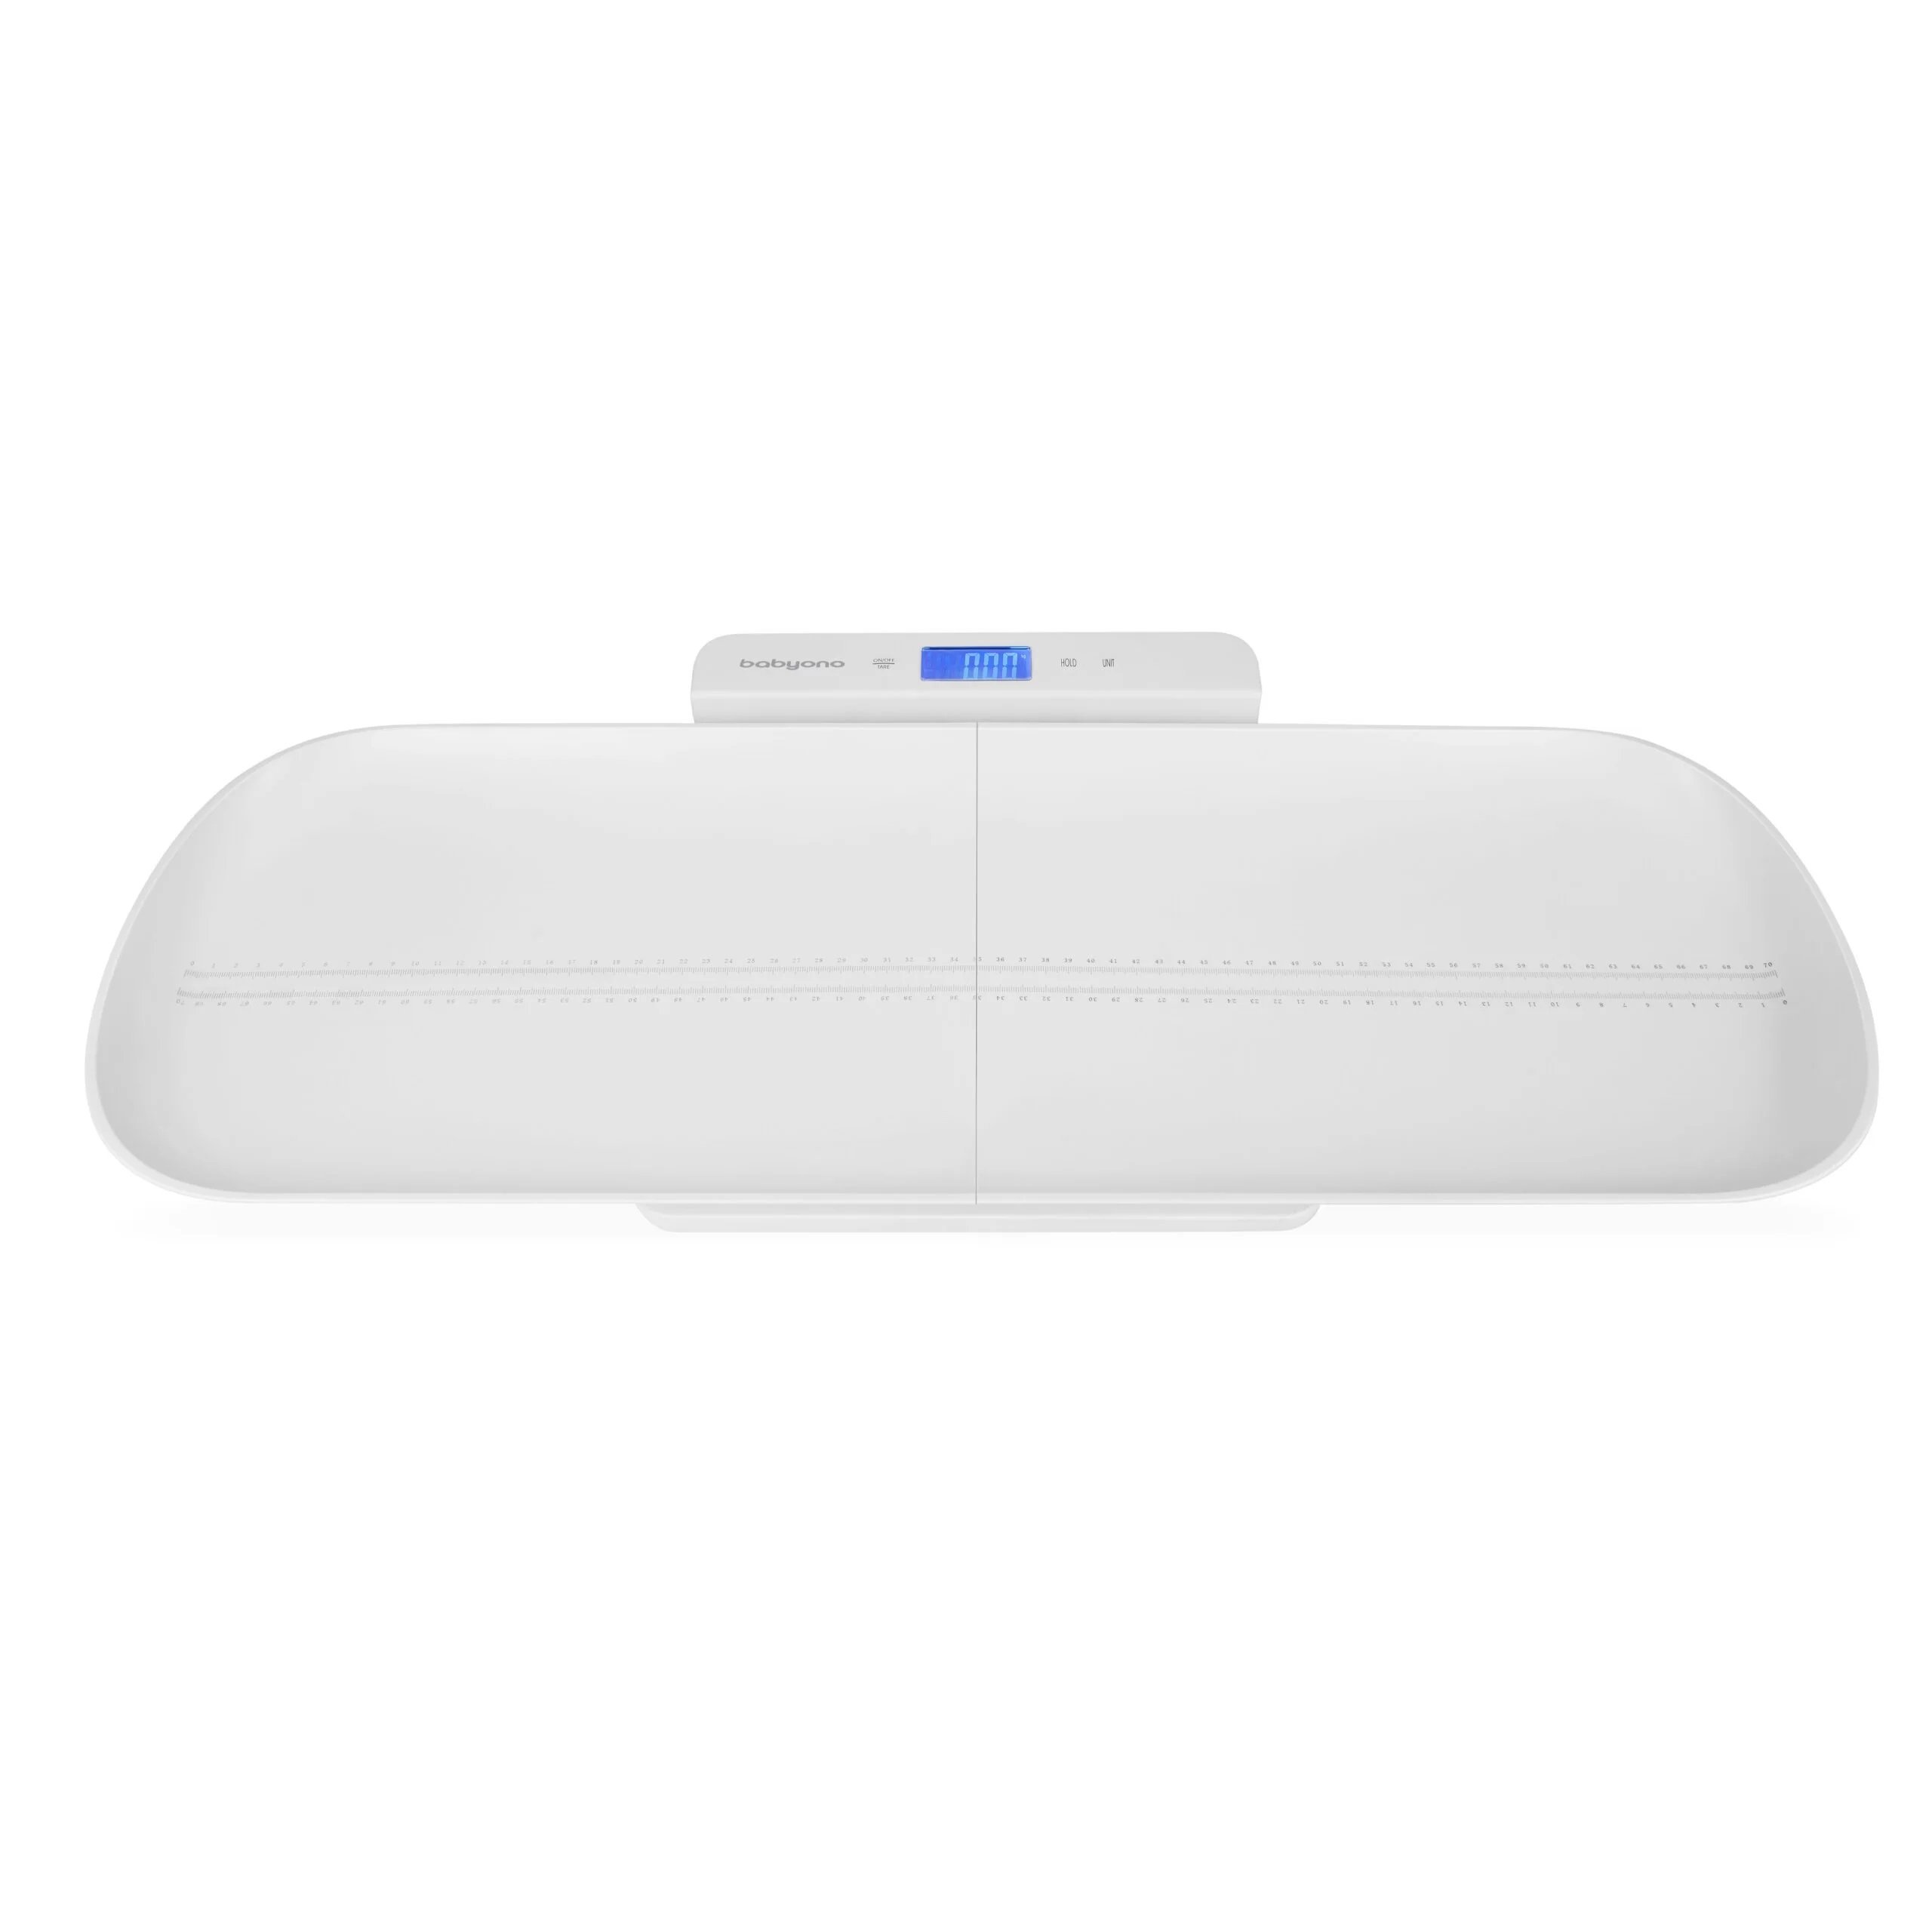 Doj�ensk� elektronick� v�ha SMART 2v1 s Bluetooth - zv��i� obr�zok